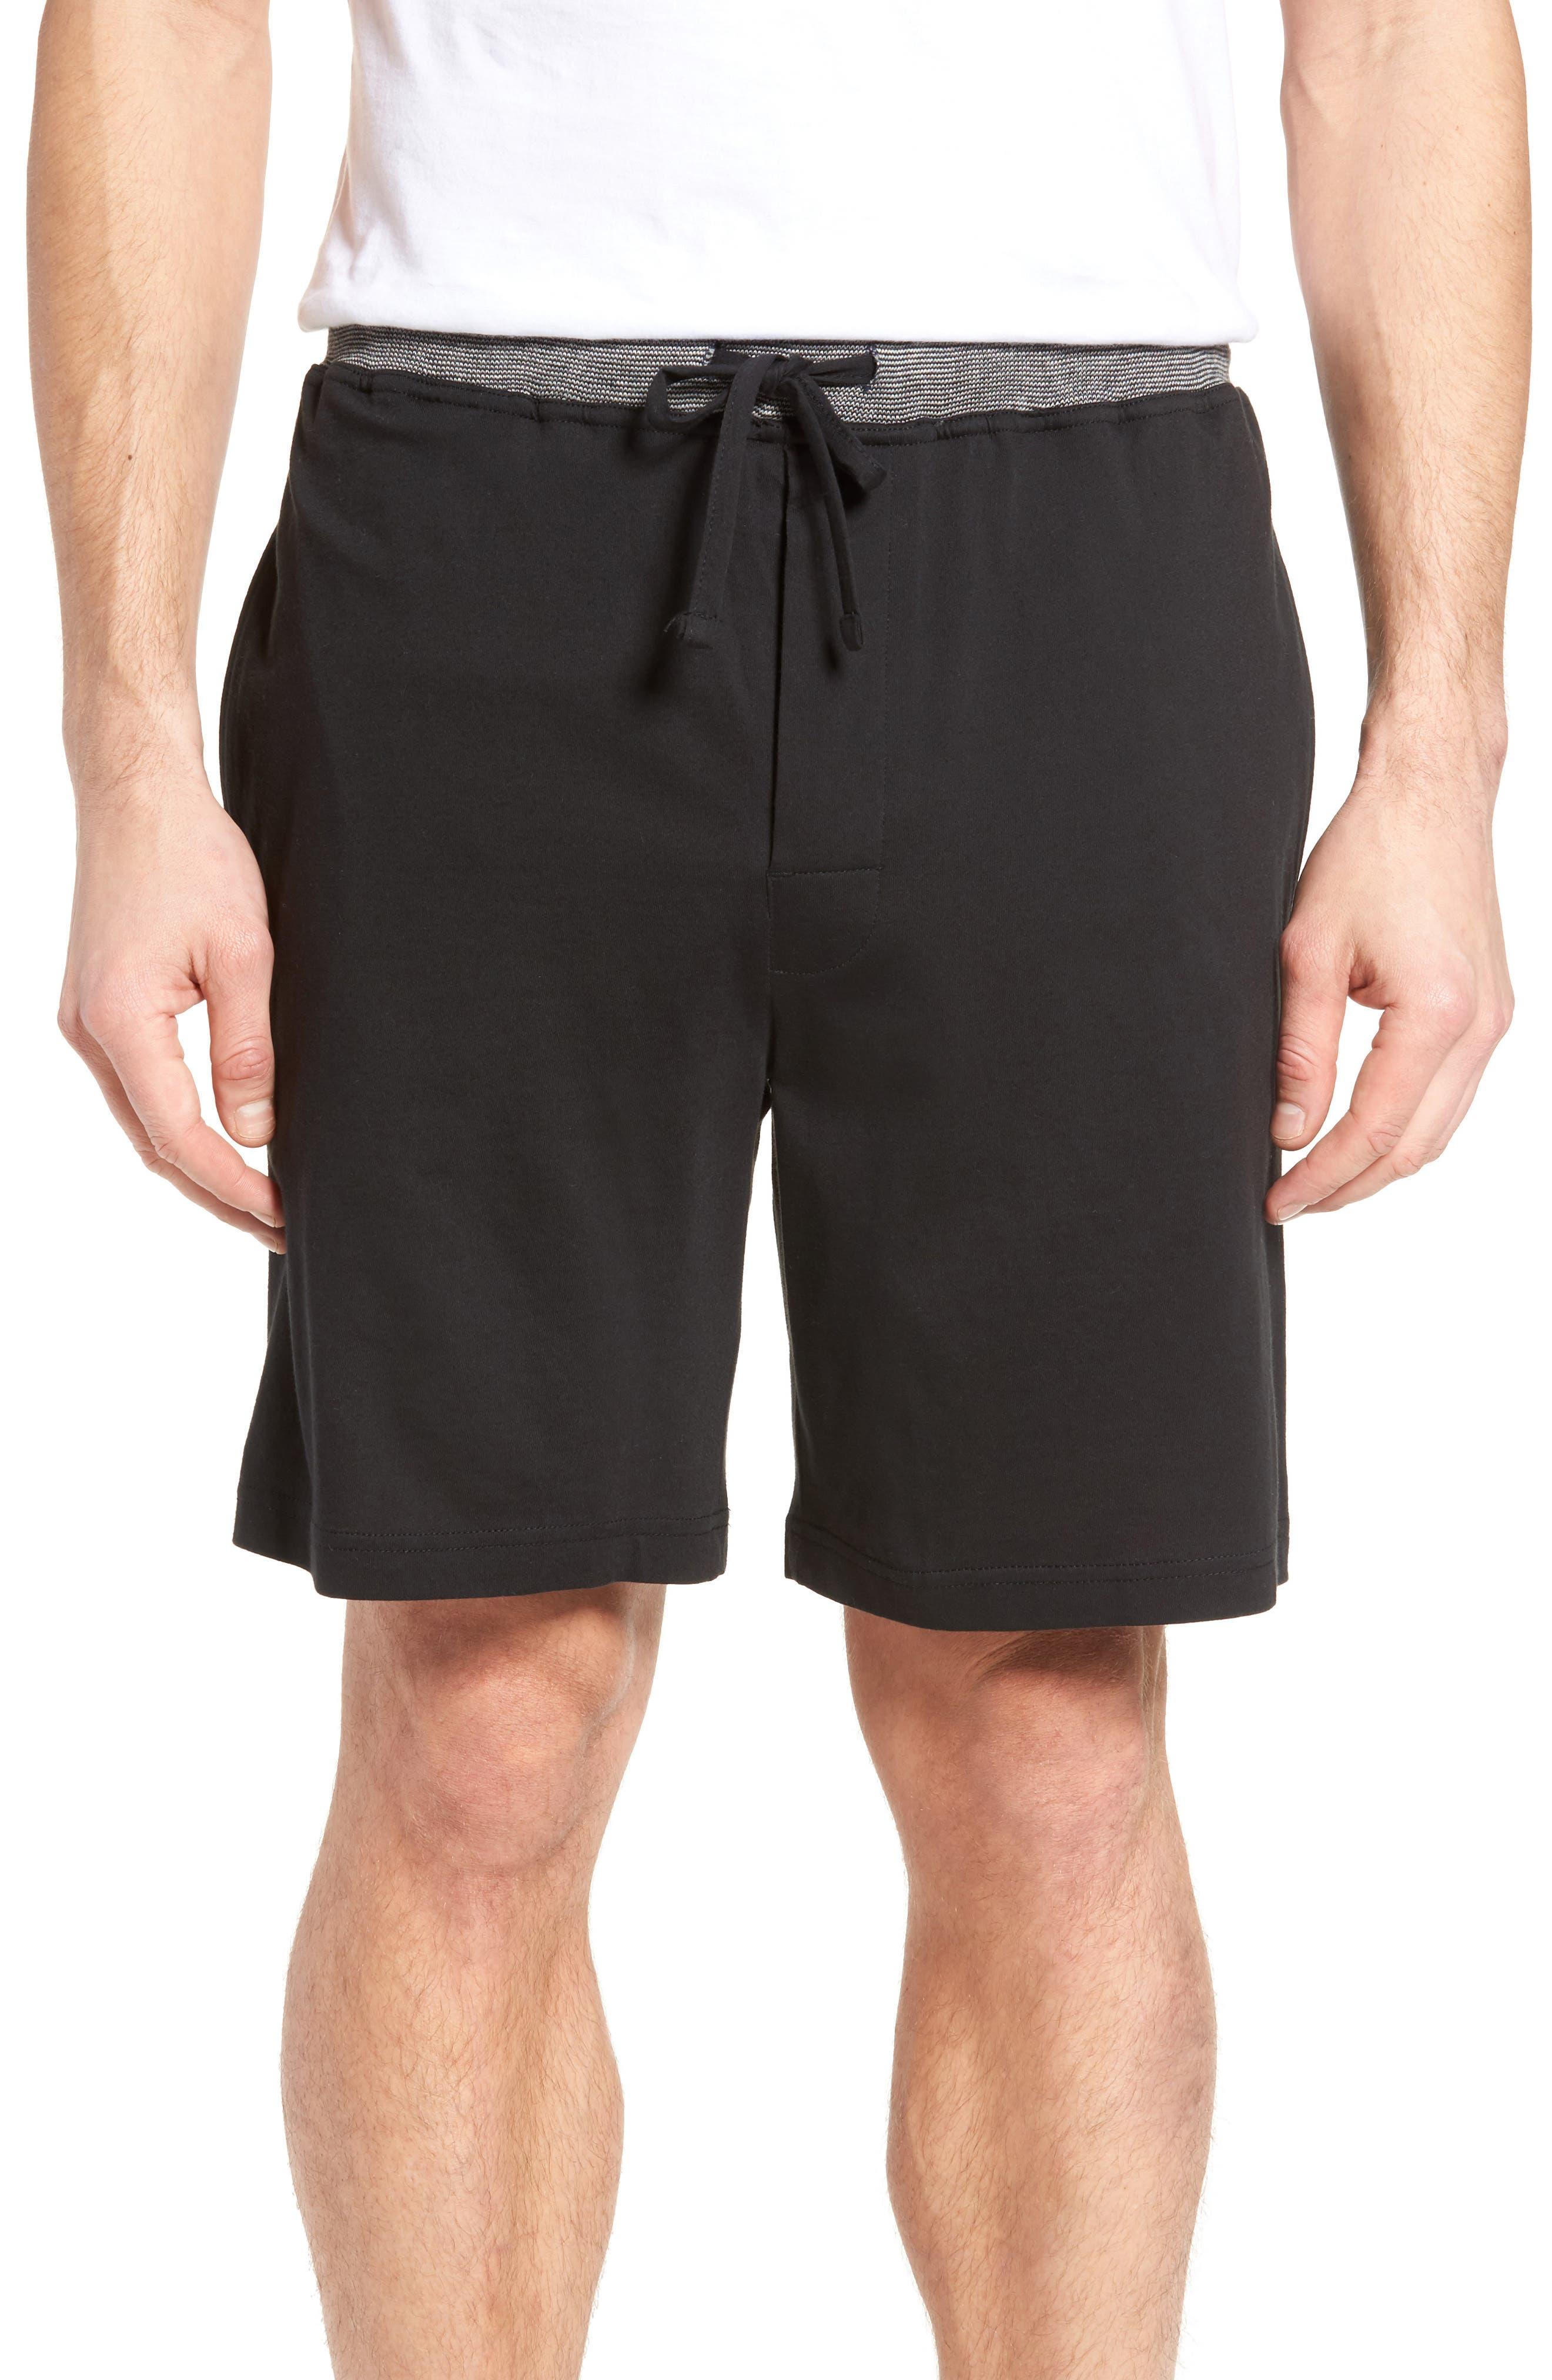 Cotton Lounge Shorts,                             Main thumbnail 1, color,                             Solid Black